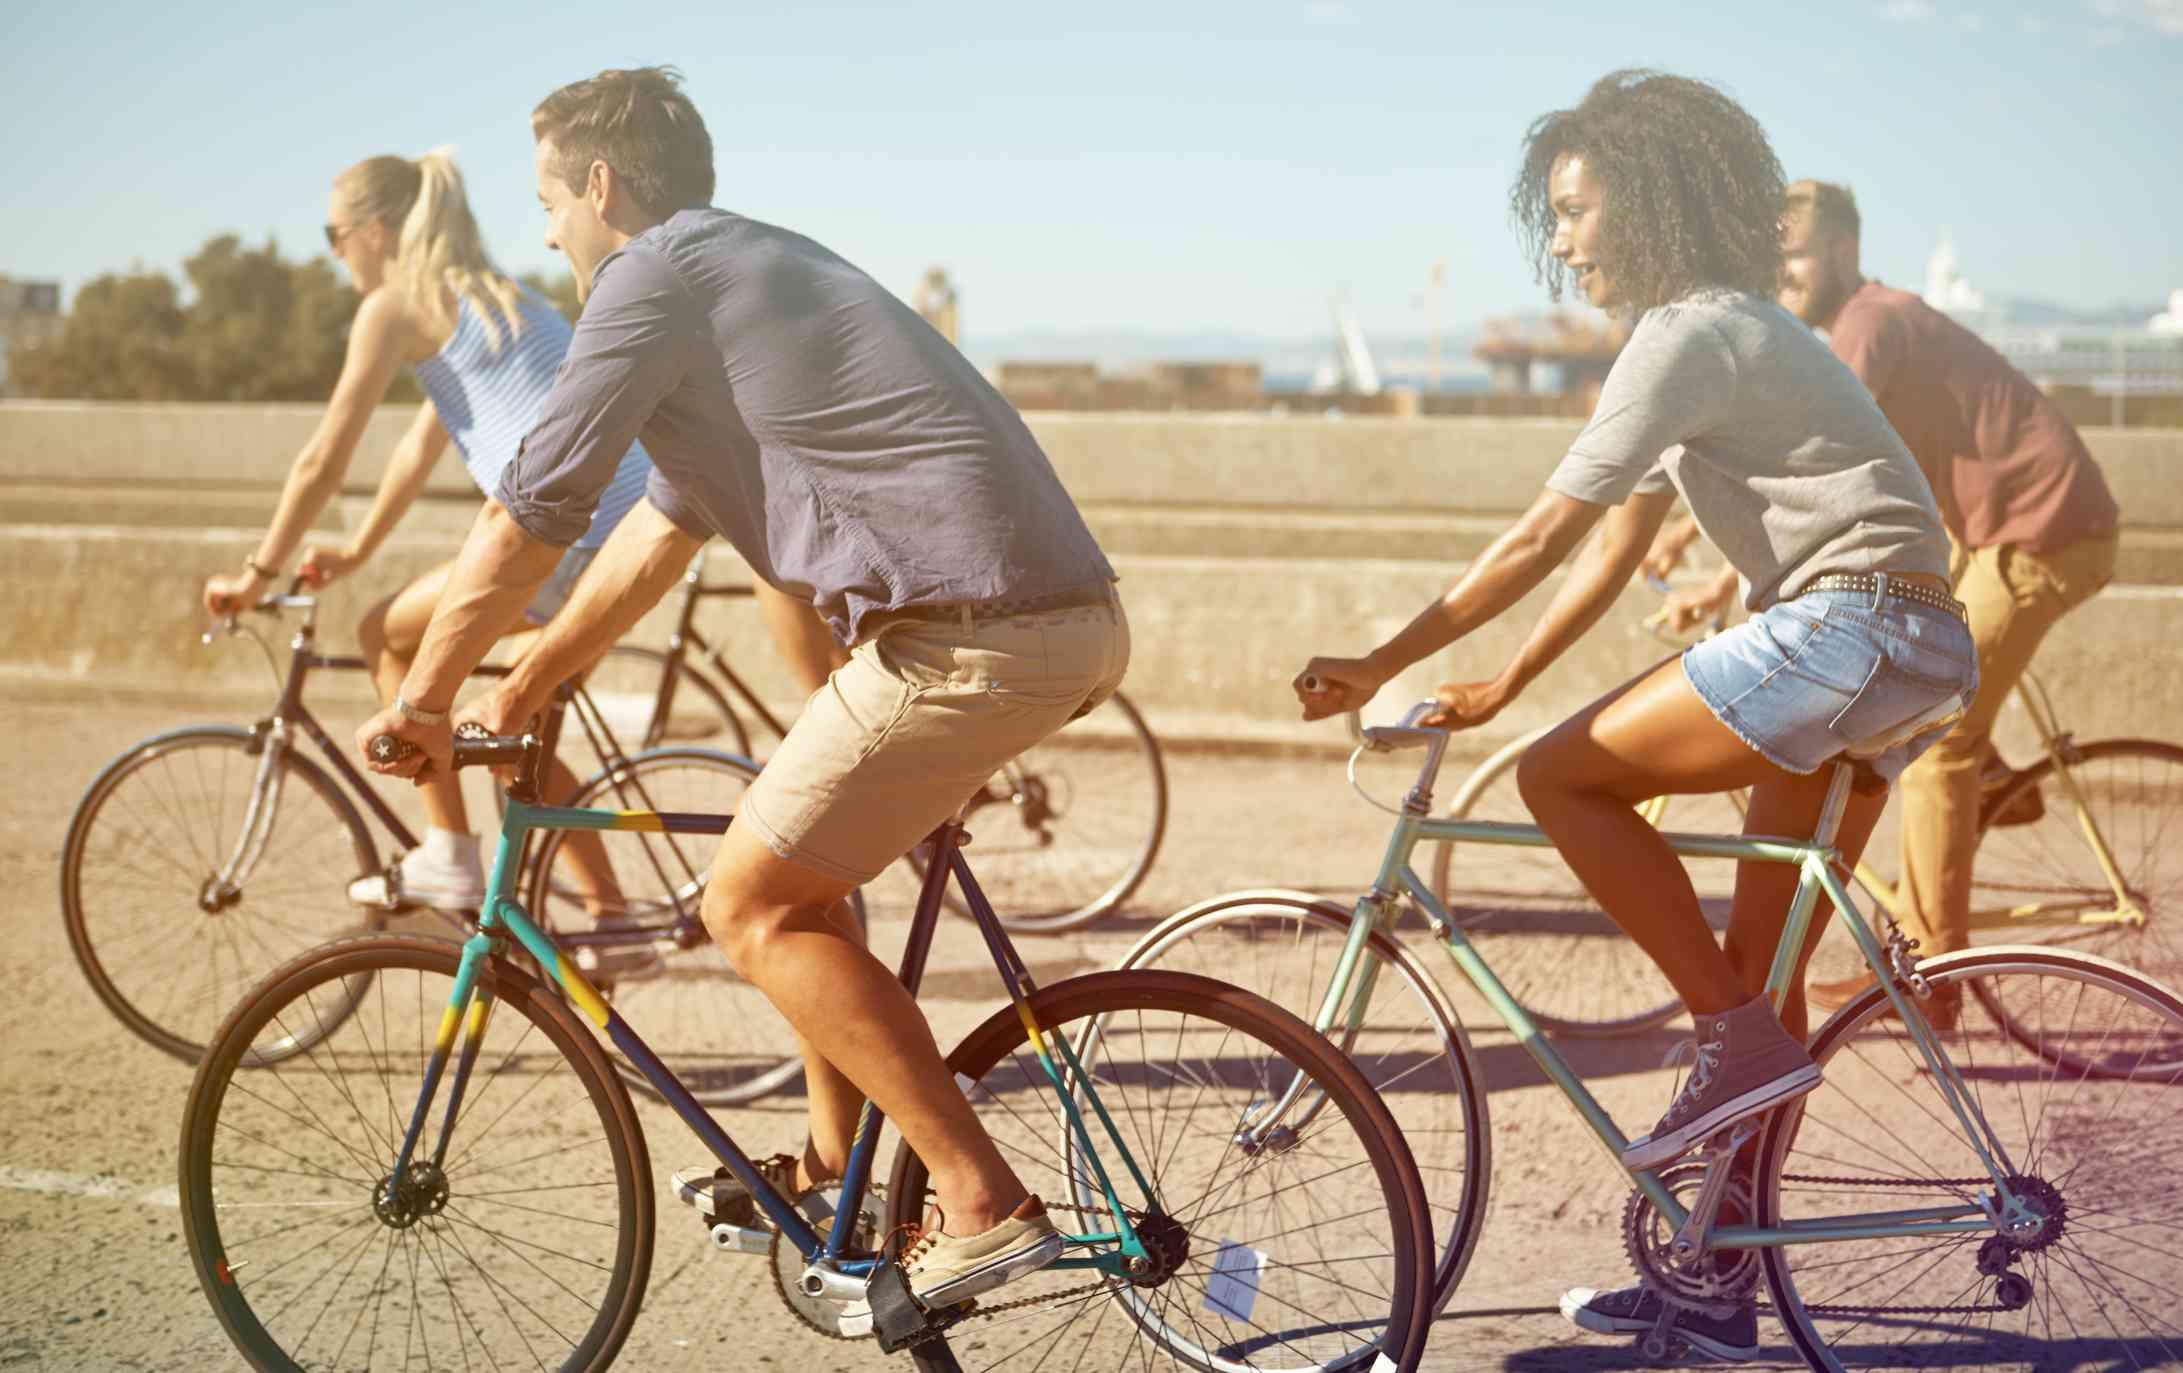 Four friends biking